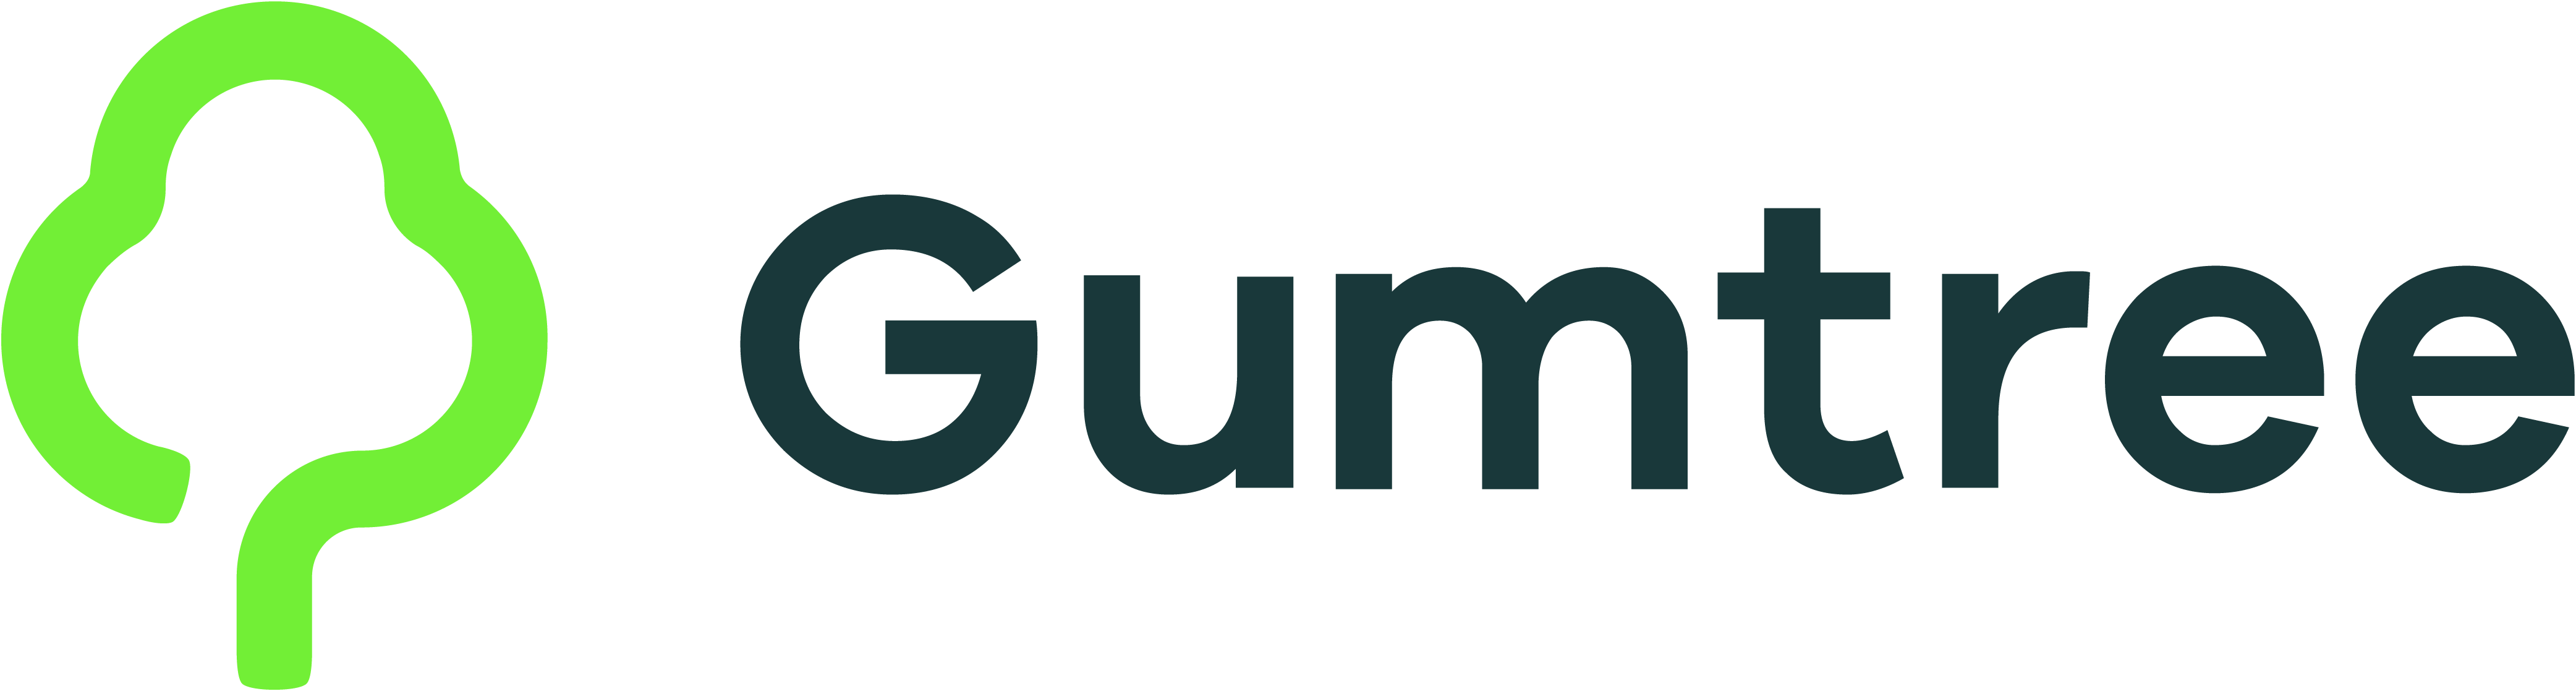 Gumtree_2016-01